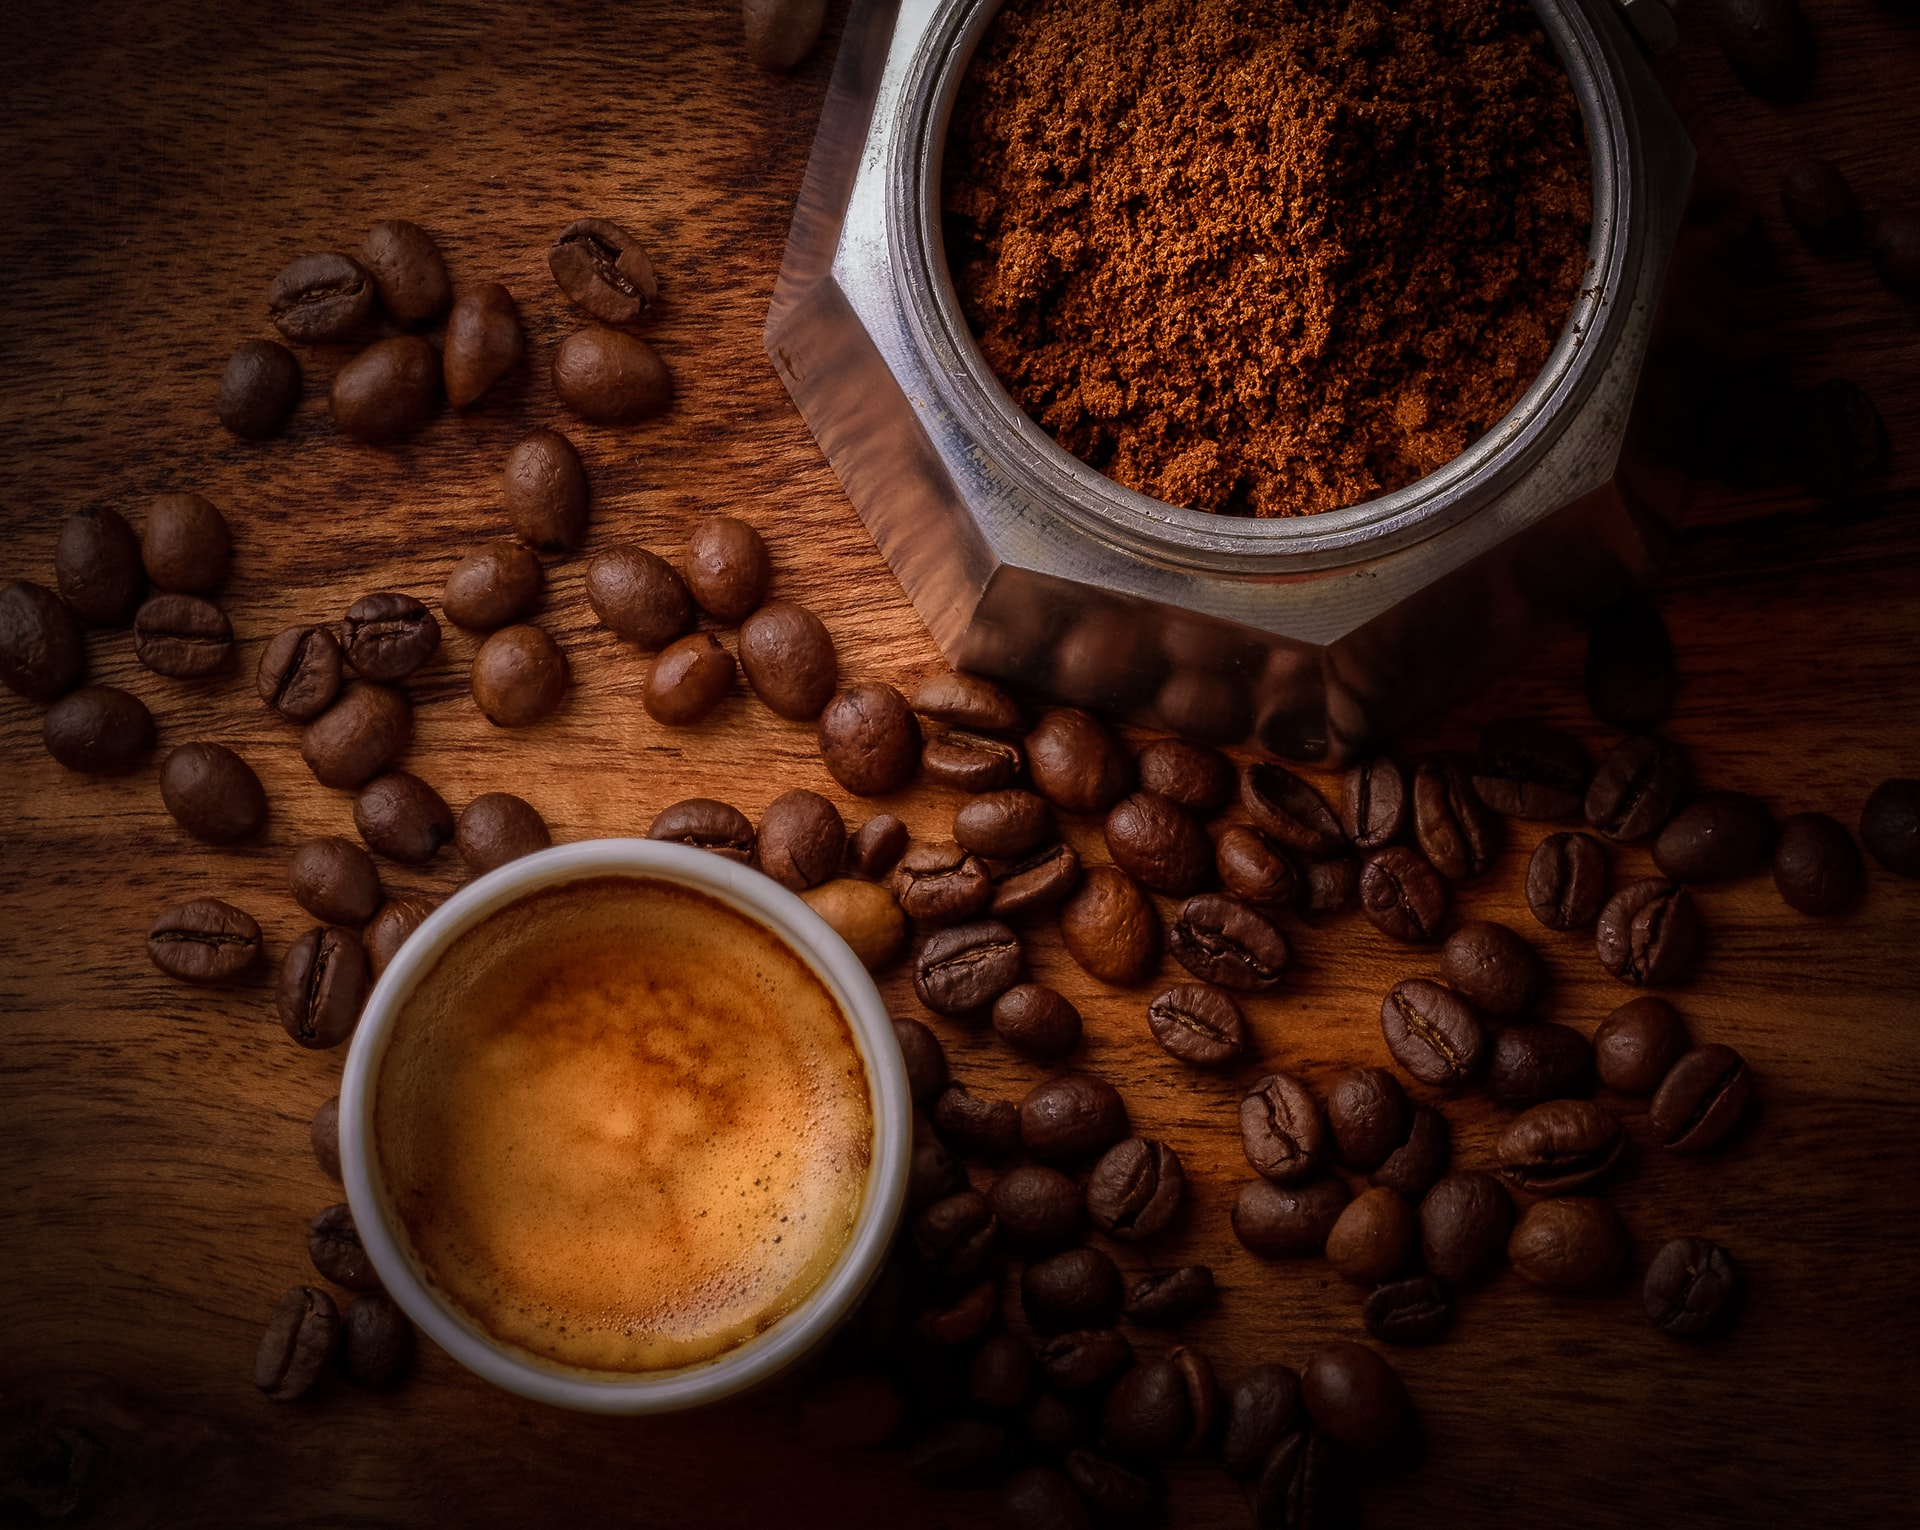 Kopi Luwak – was macht den Katzenkaffee so besonders?